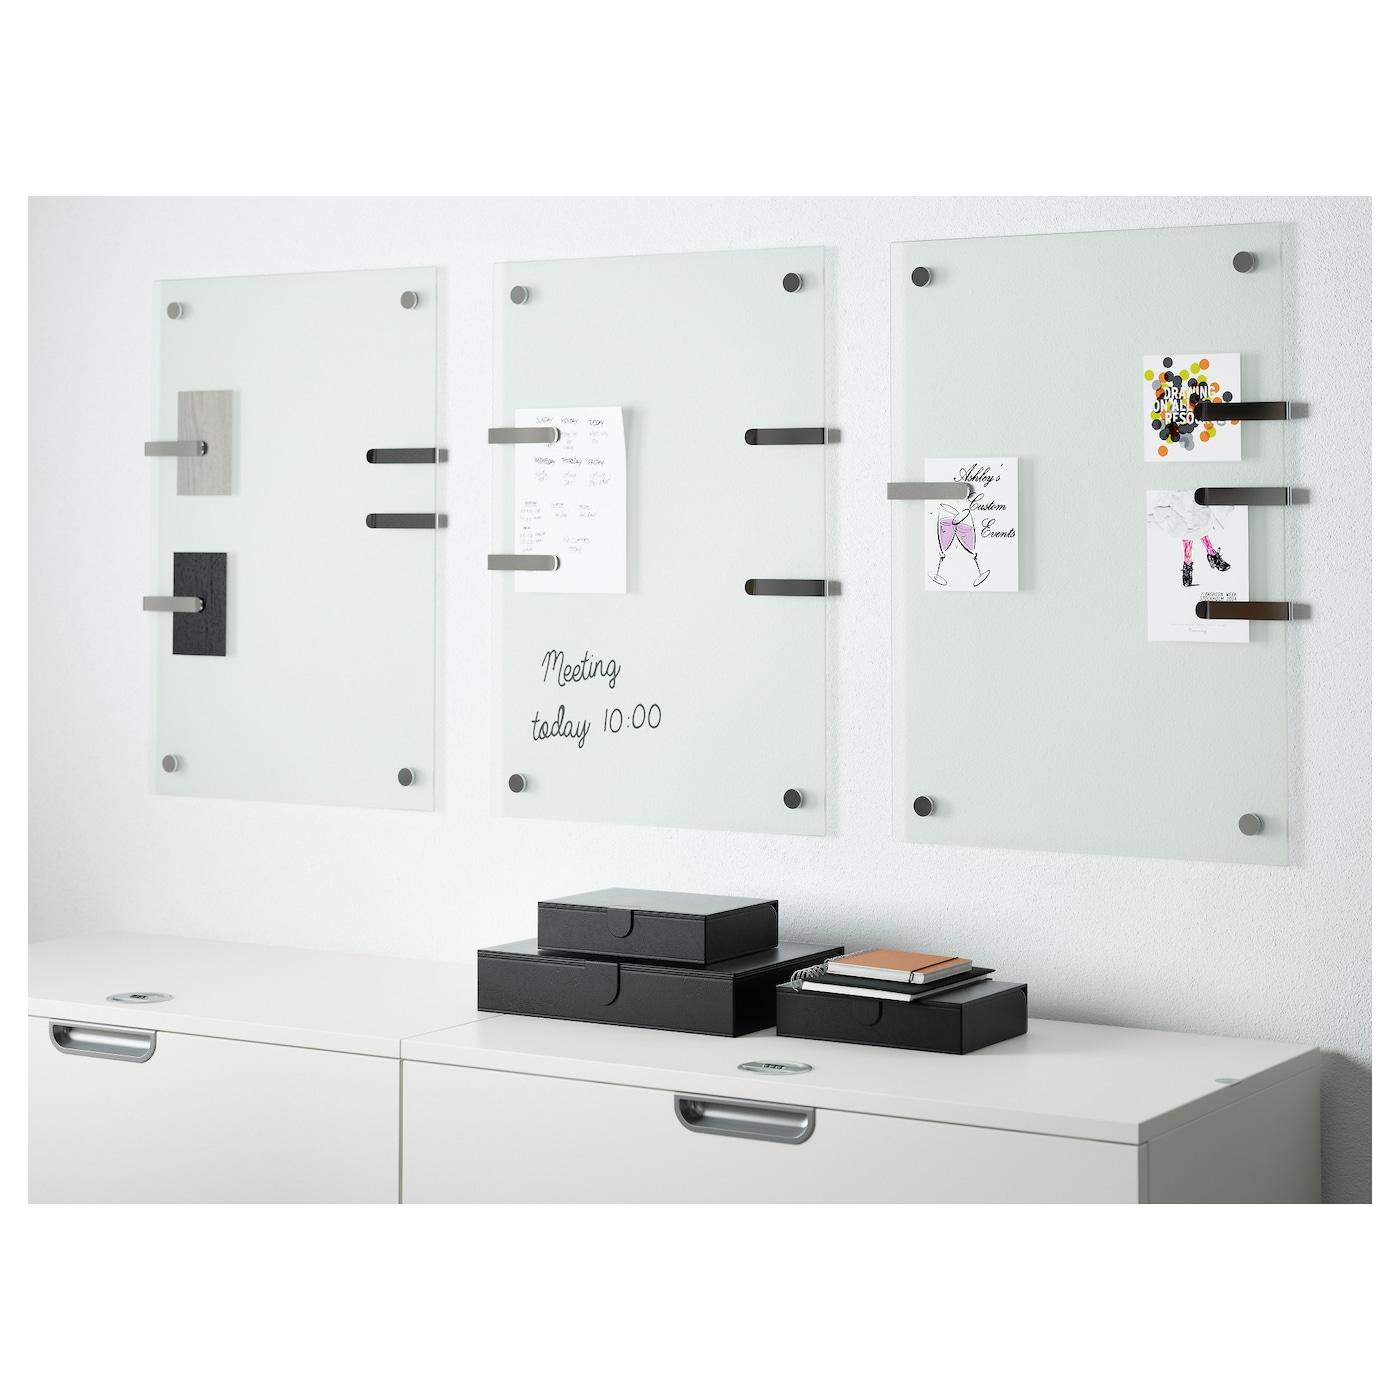 kludd tableau d 39 affichage verre 65x45 cm ikea. Black Bedroom Furniture Sets. Home Design Ideas